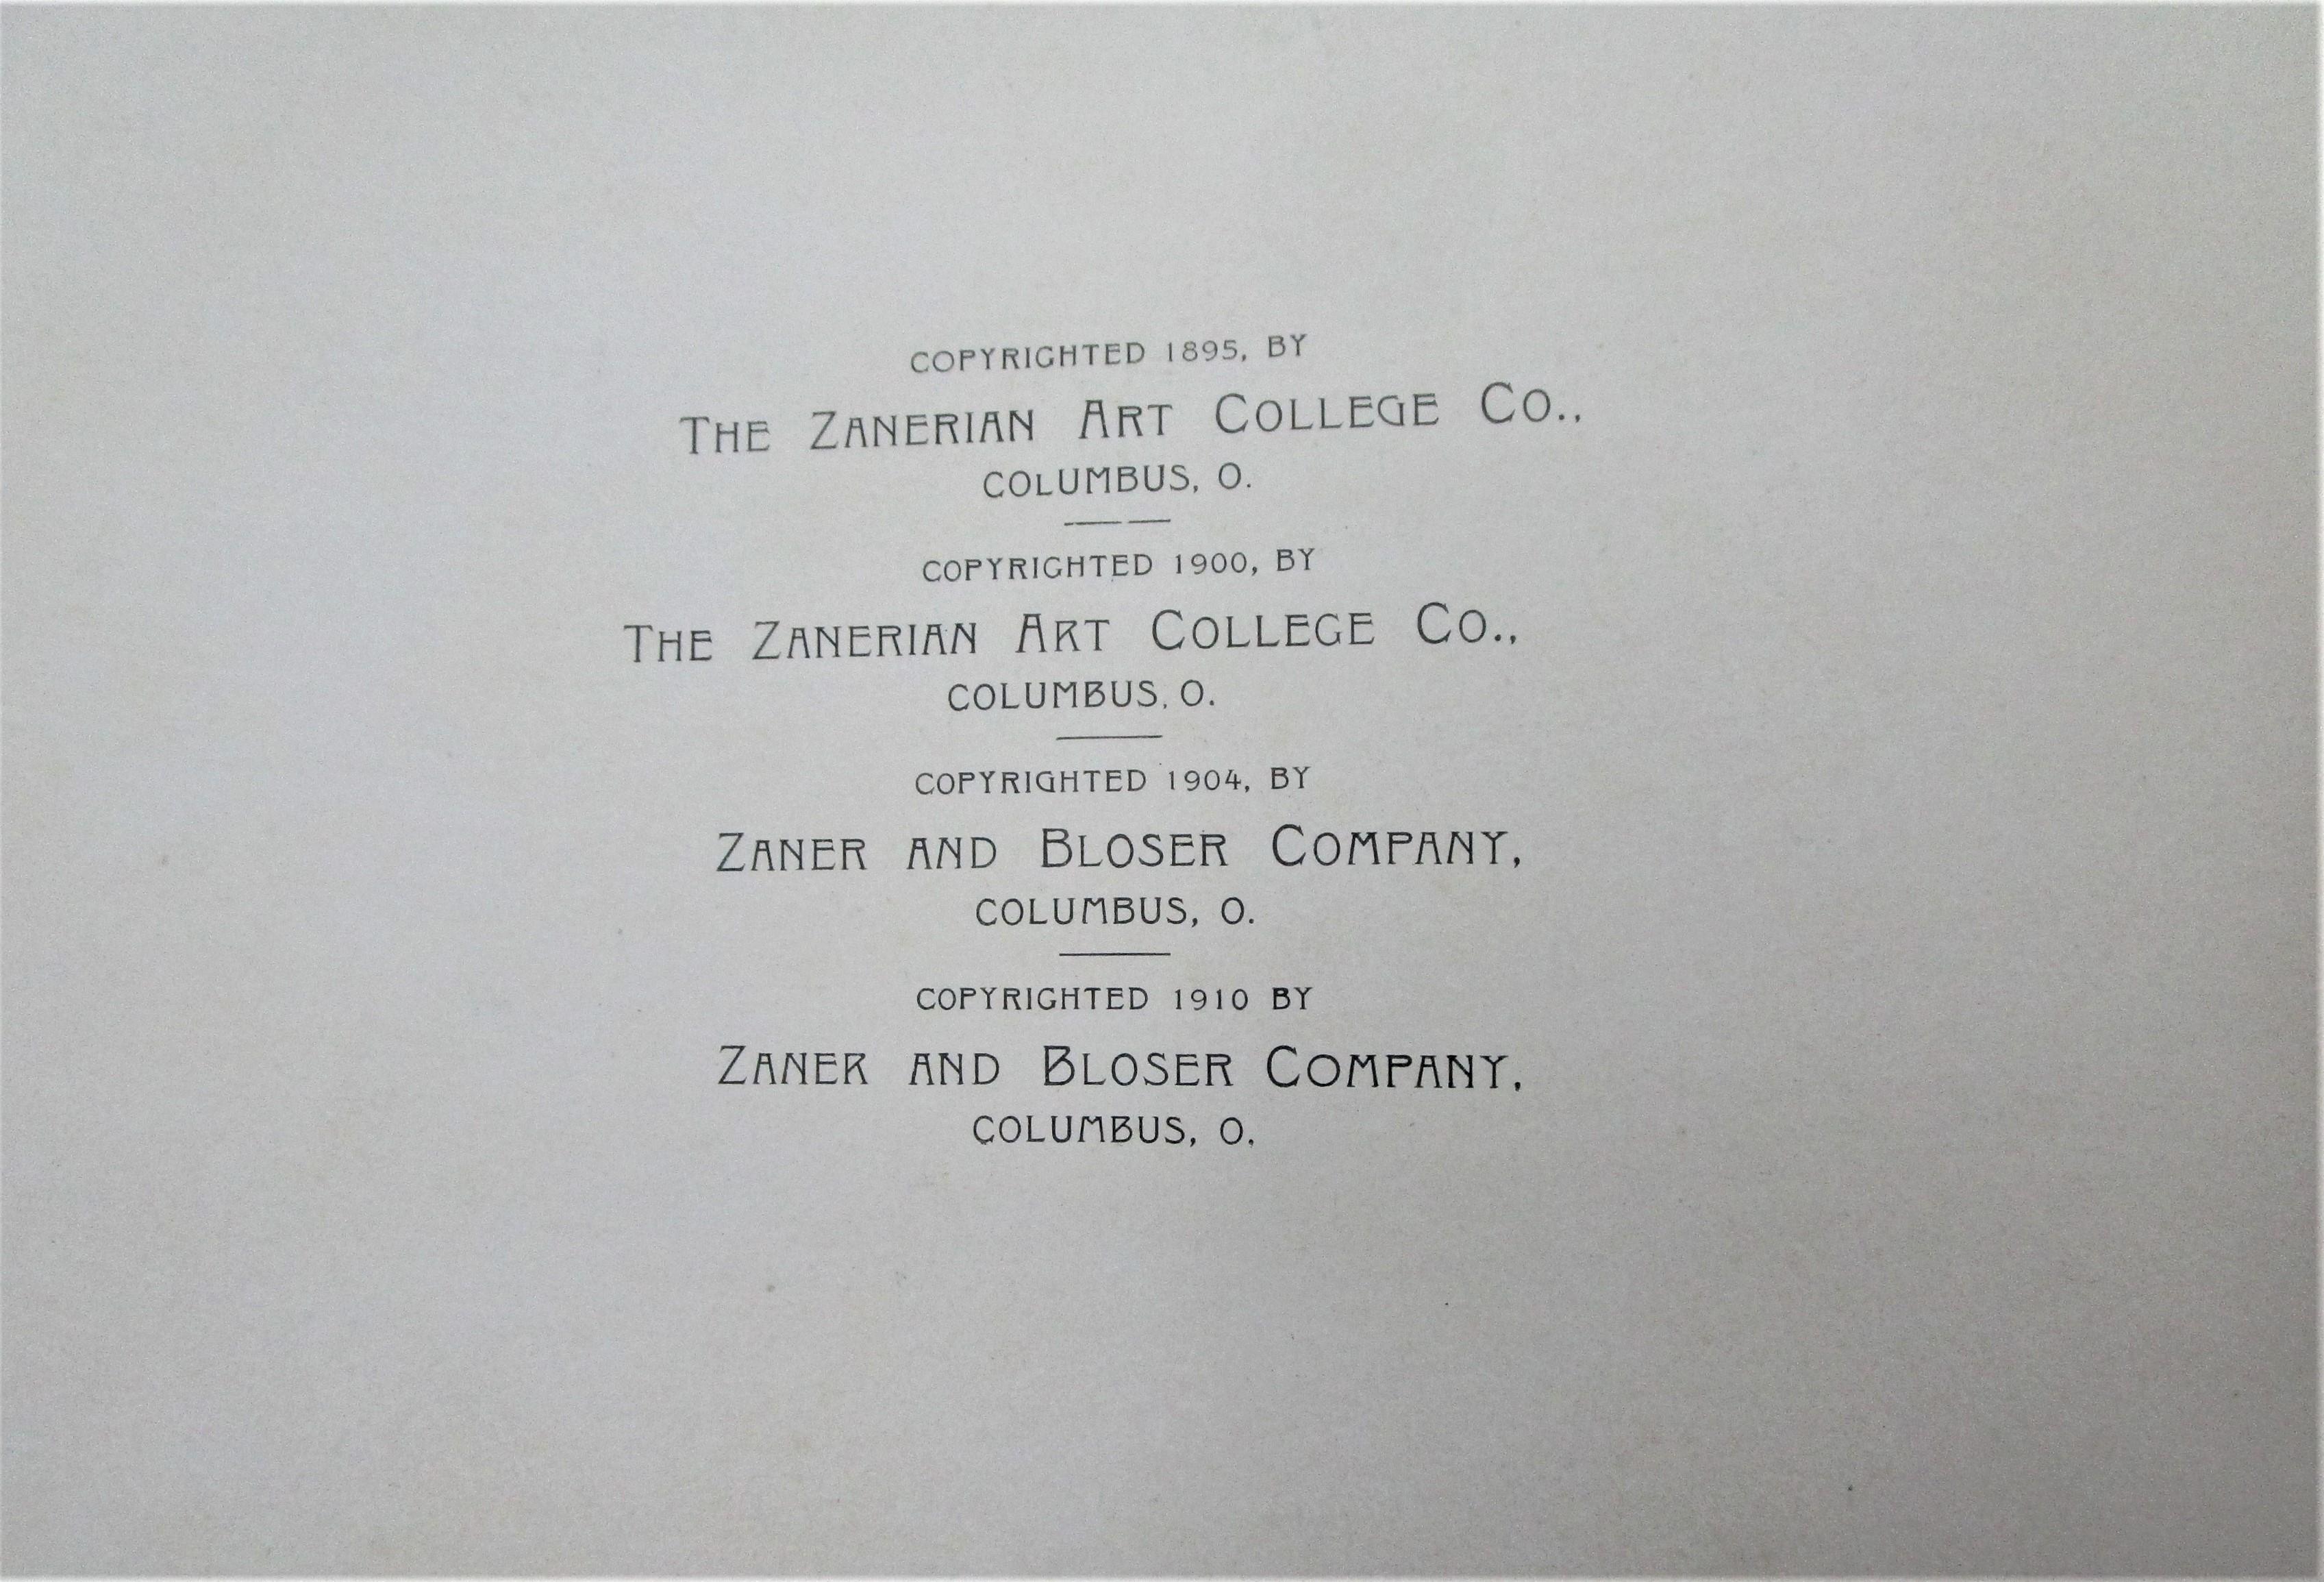 THE NEW ZANERIAN ALPHABETS, by C.P. Zaner - 1910